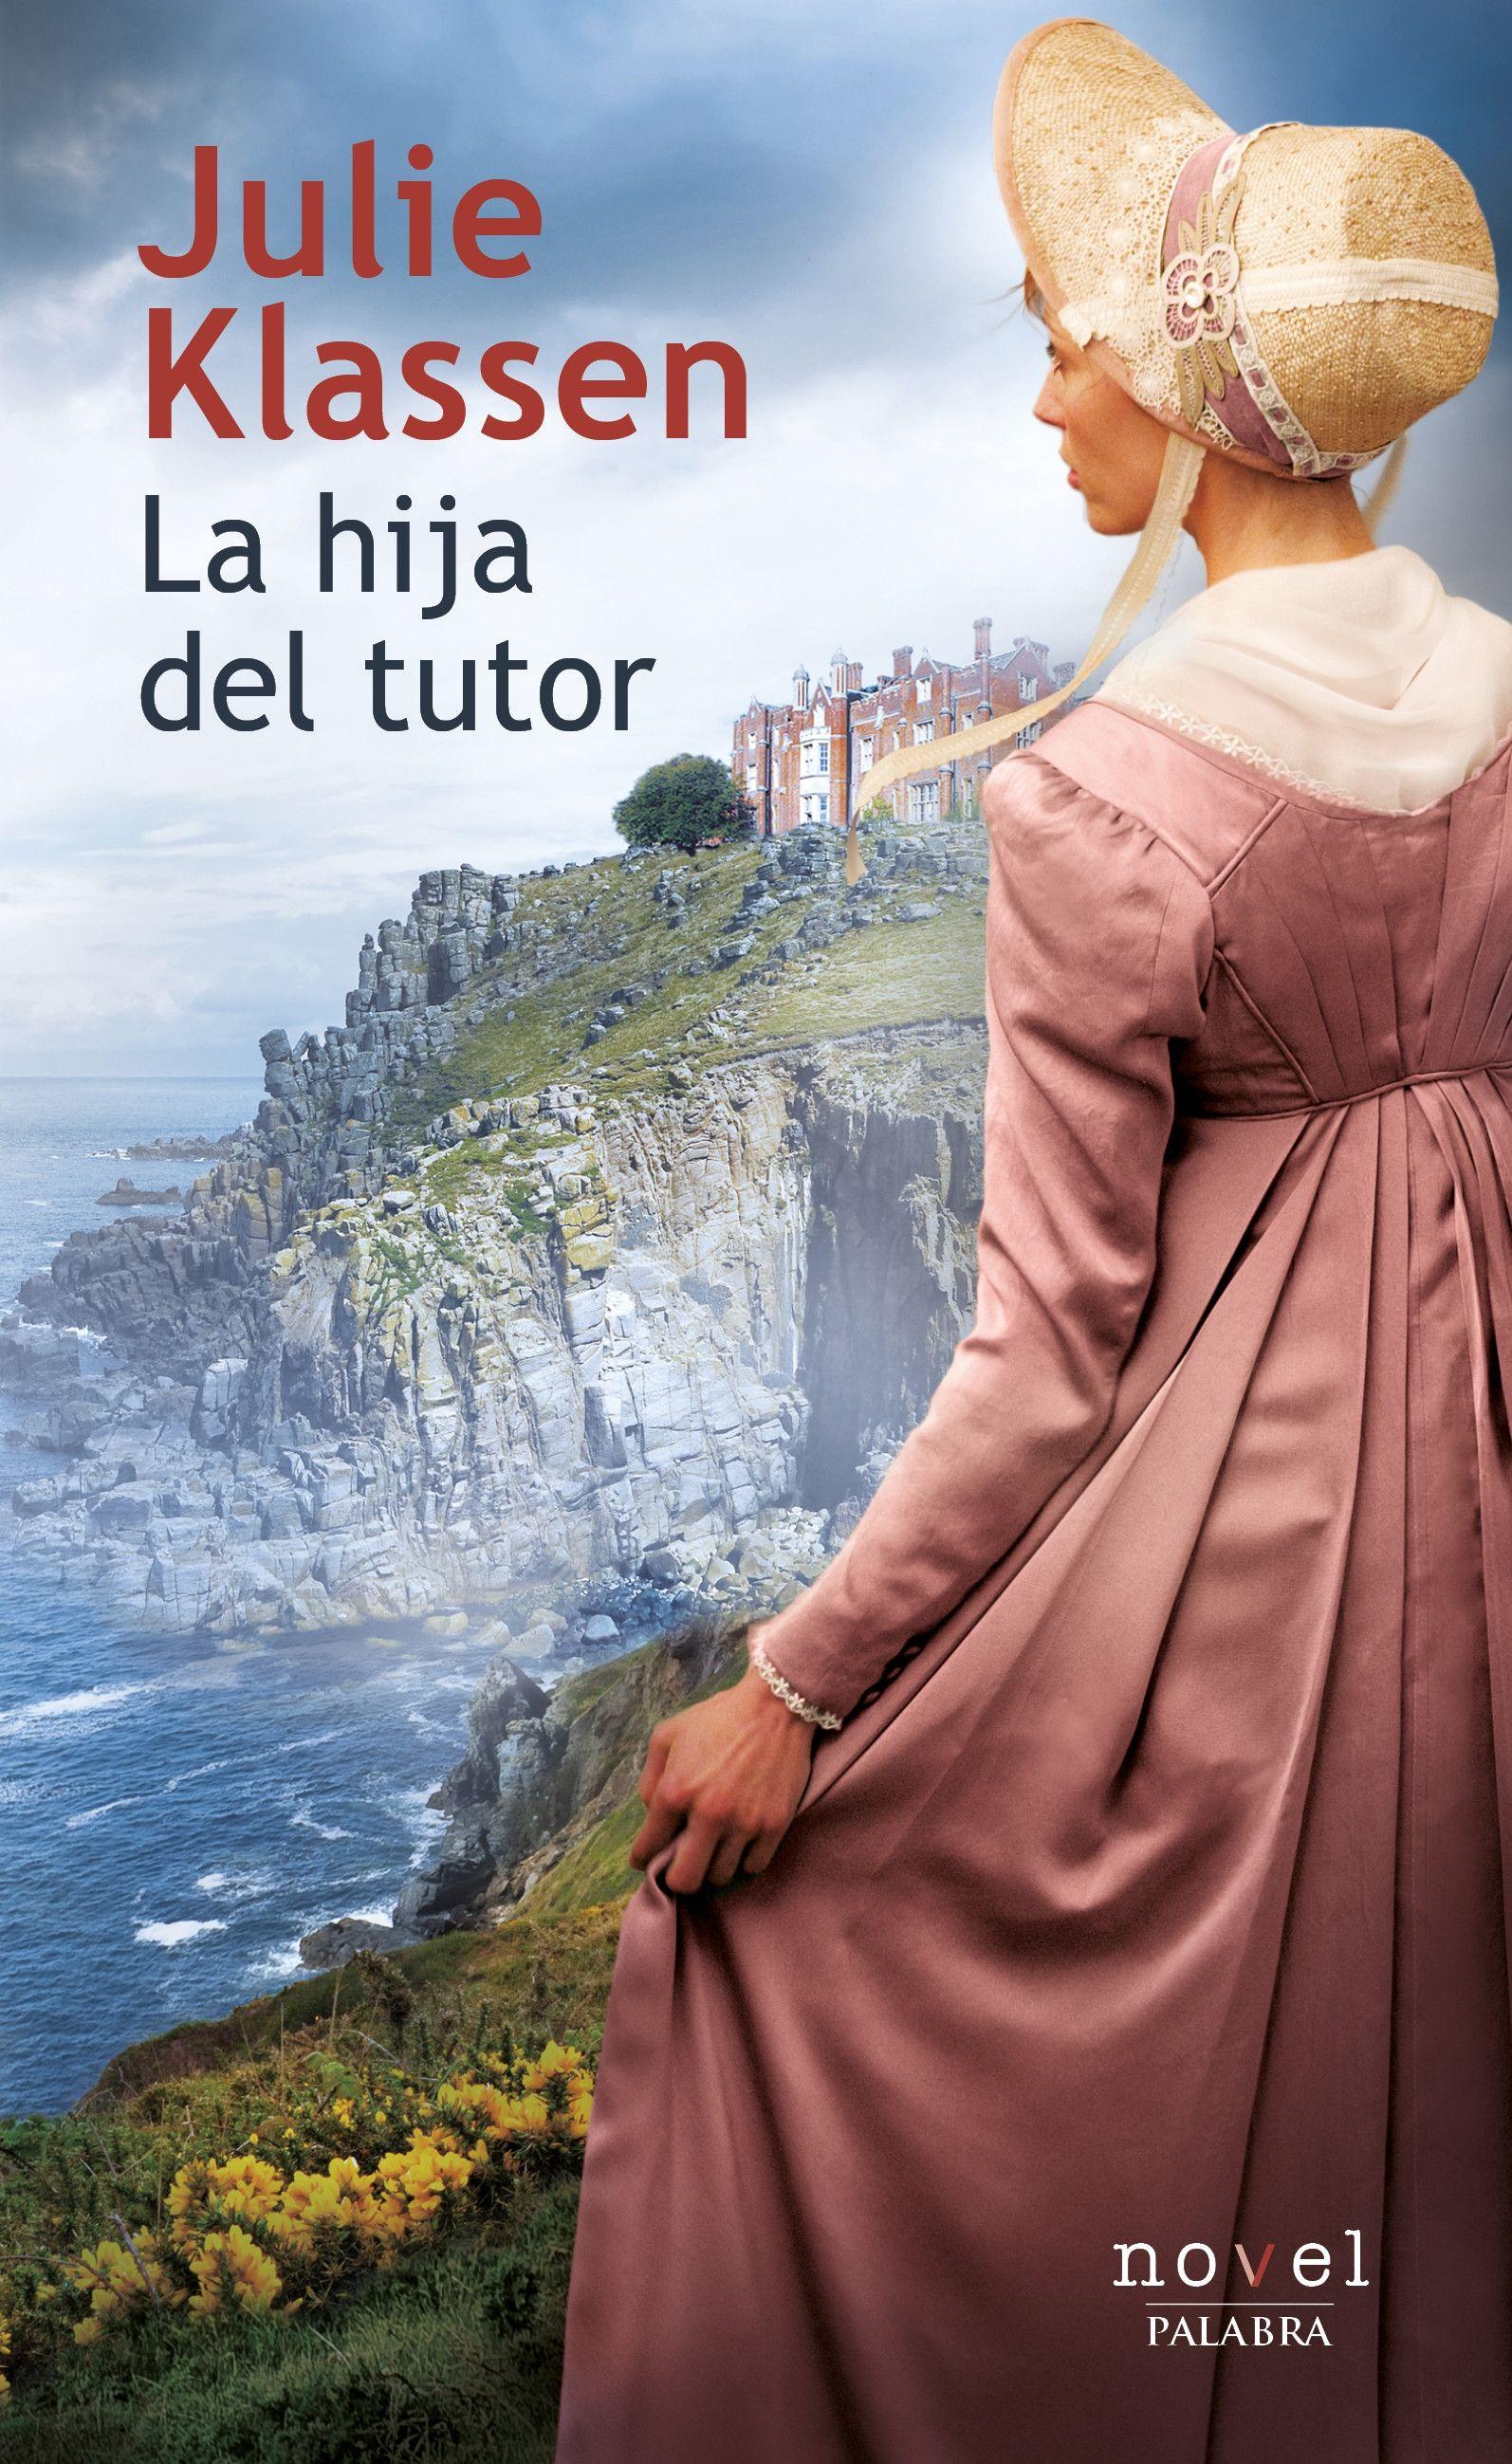 Hija del tutor